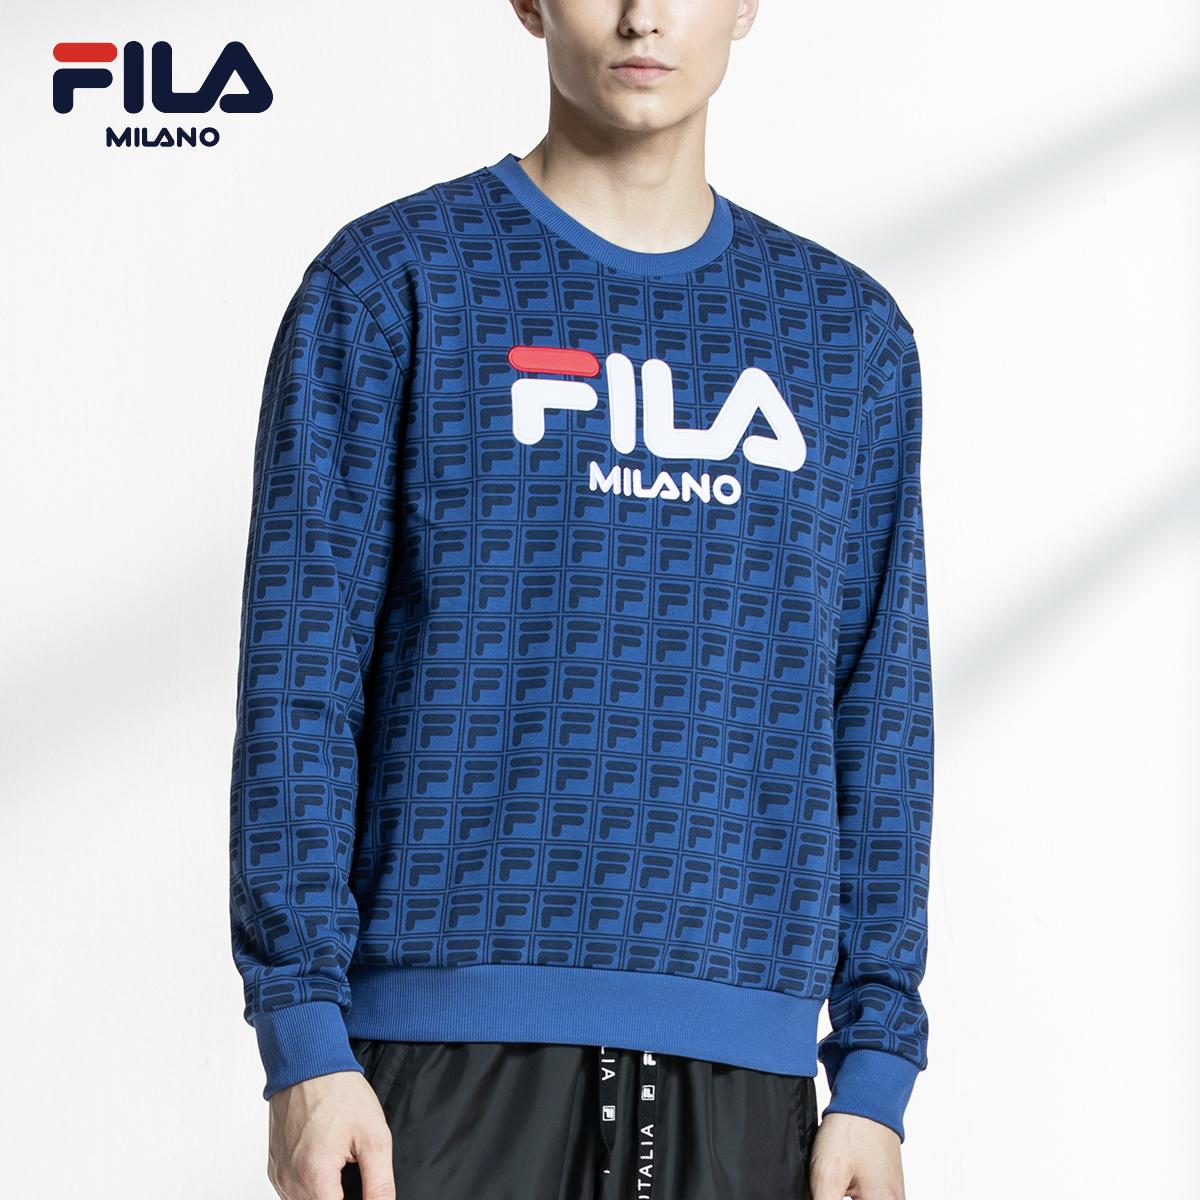 FILA米兰时装周ICONIC系列SNBN限定款 男子针织套头卫衣